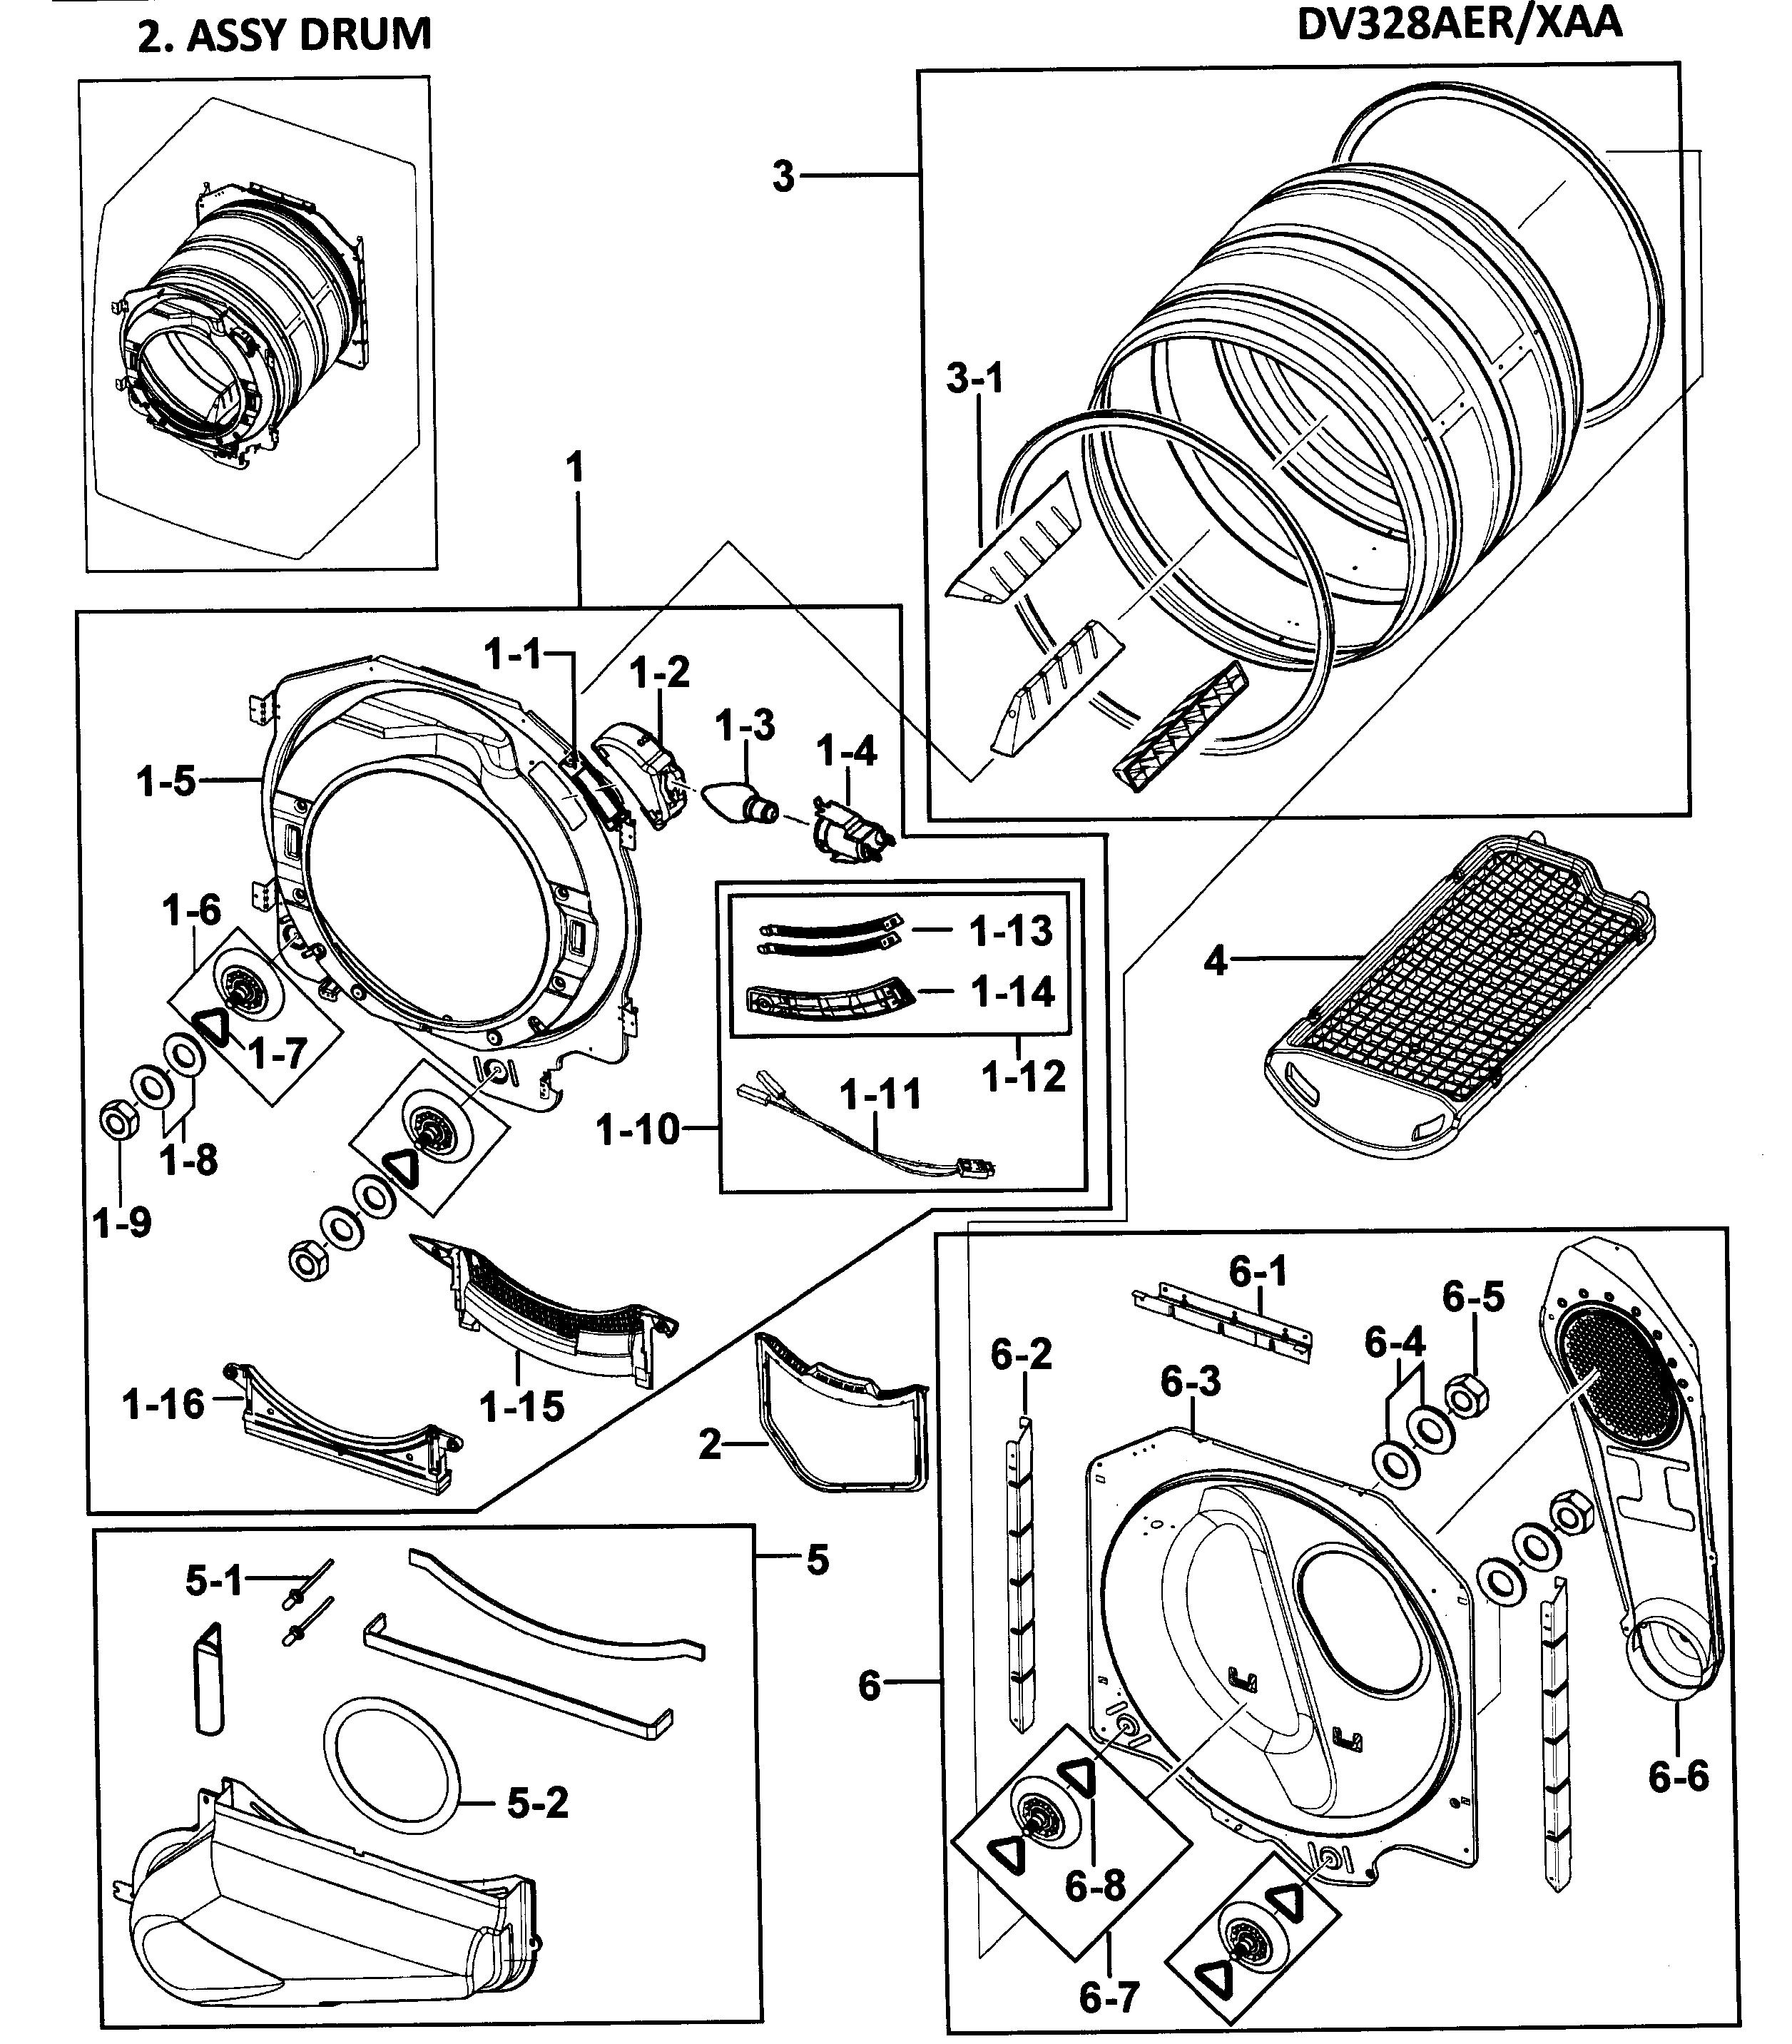 samsung dryer model dv4484agp xaa manual